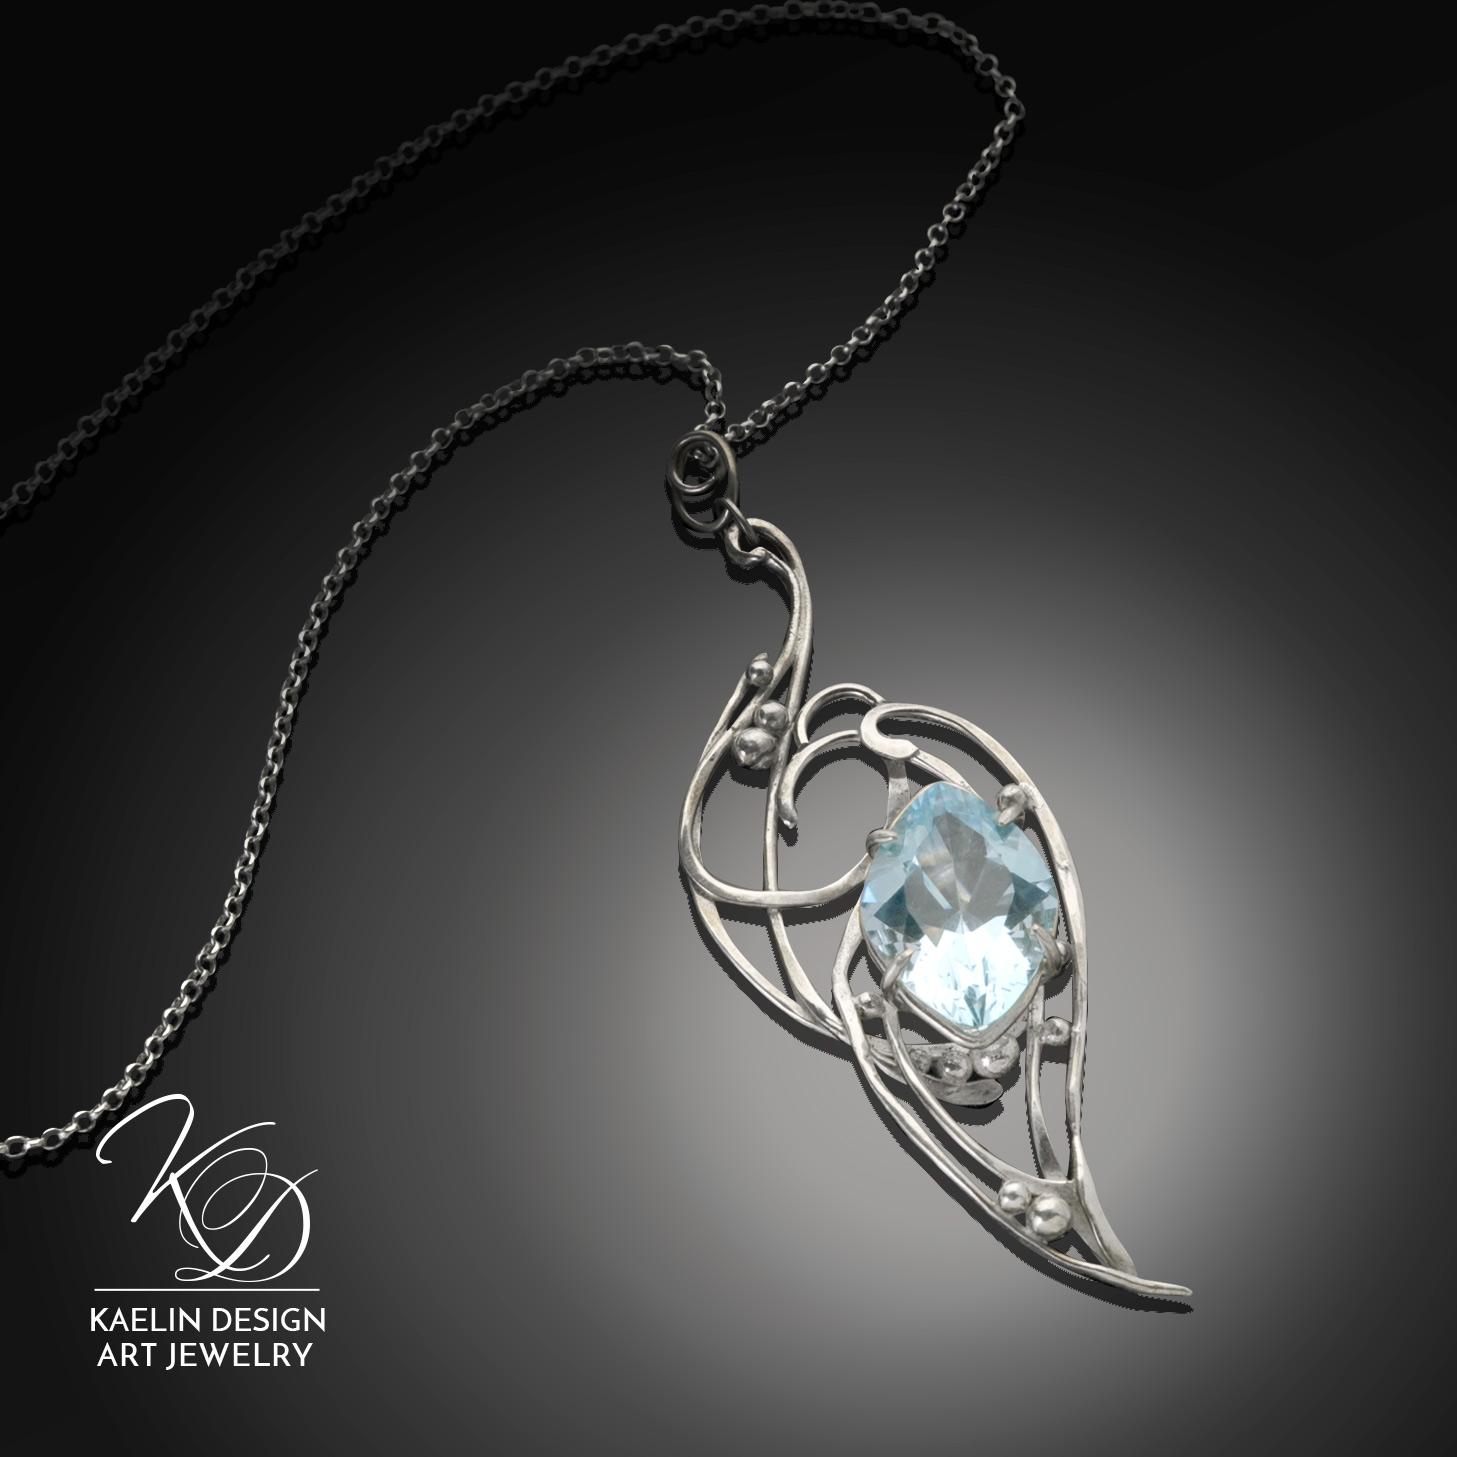 Lady of Shalott Blue Topaz Fine Art Jewelry Pendant by Kaelin Design